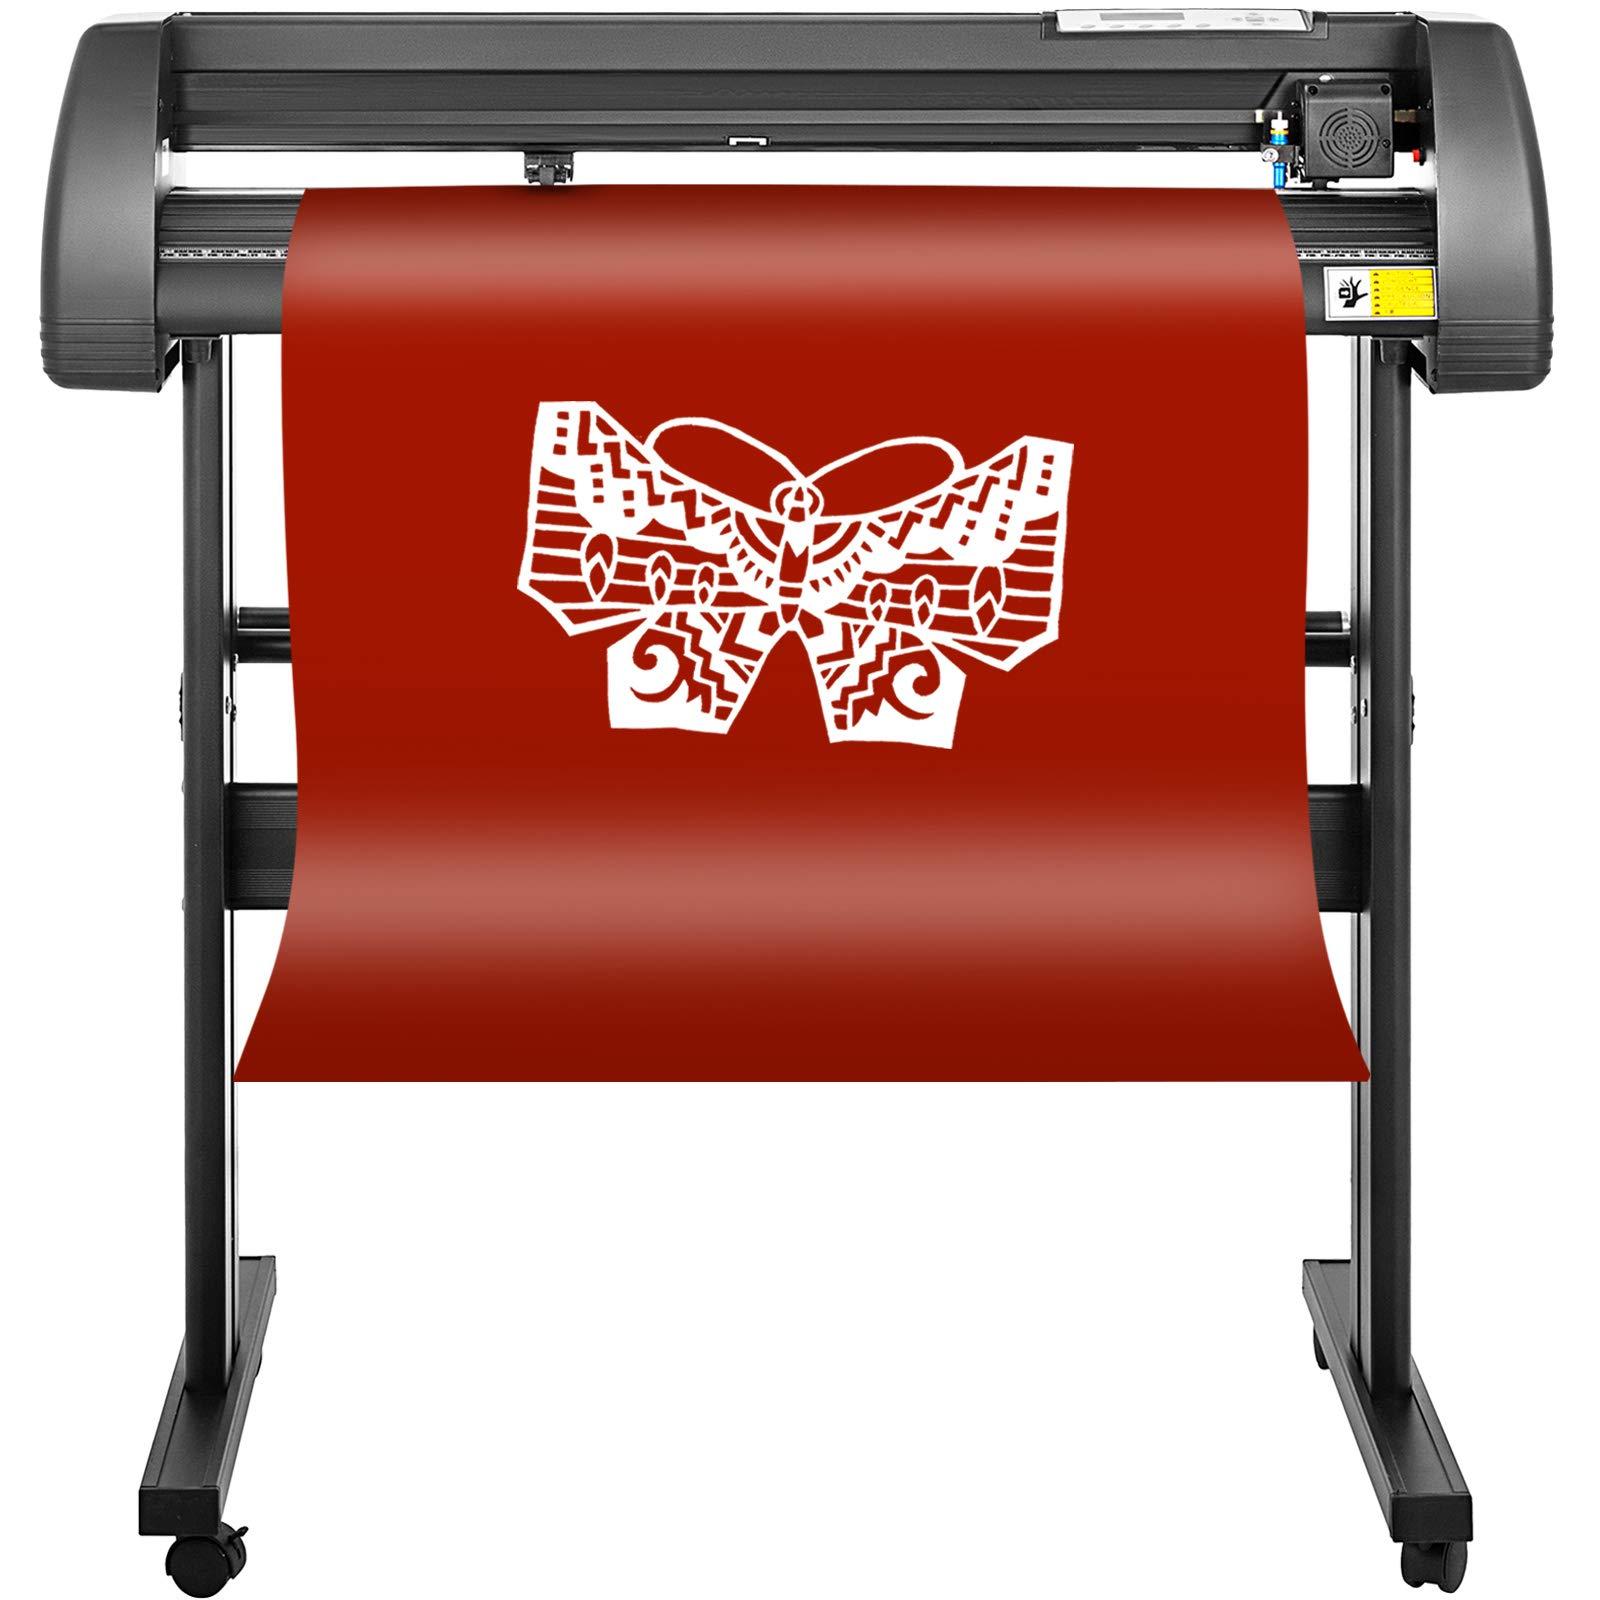 Mophorn Vinyl Cutter 28 Inch Vinyl Cutter Machine 720mm Vinyl Printer Cutter Machine LCD Display Vinyl Plotter Cutter Machine Signmaster Software Sign Making Machine with Stand by Mophorn (Image #3)